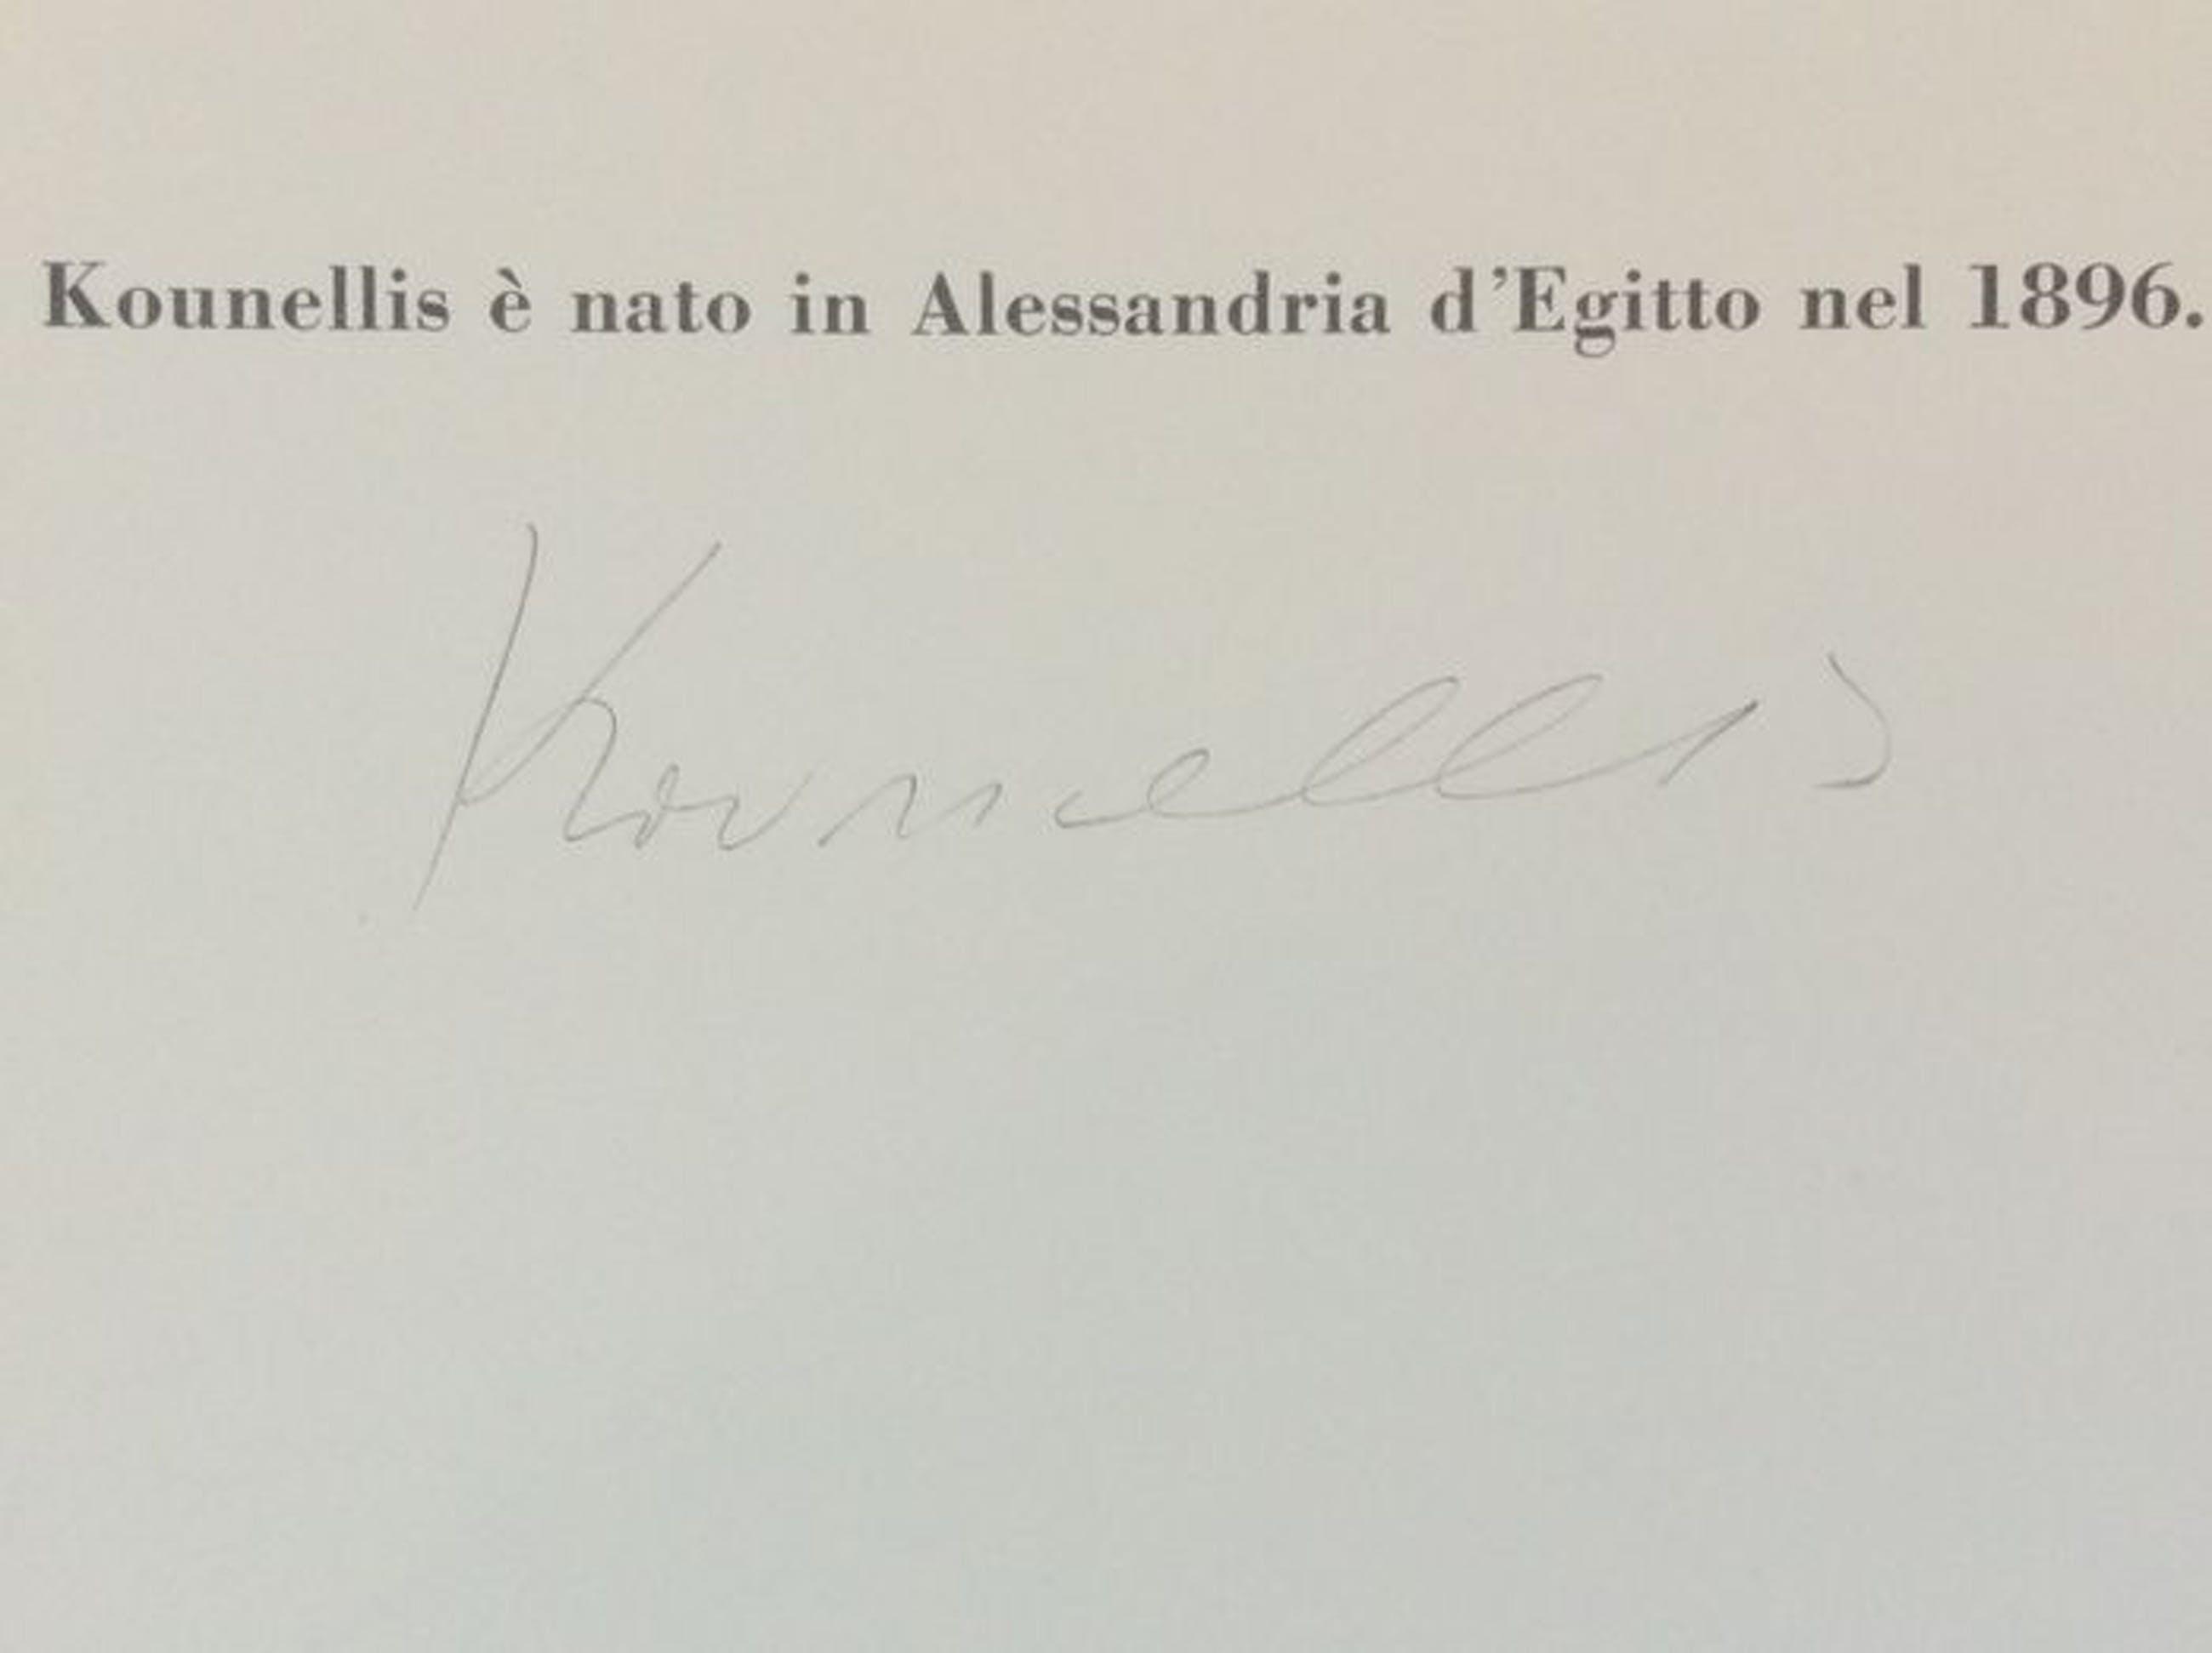 Jannis Kounellis - Jules Verne, Un Capitano di Quindici Anni: I Viaggi Straordinari, Naples, Lucio kopen? Bied vanaf 800!